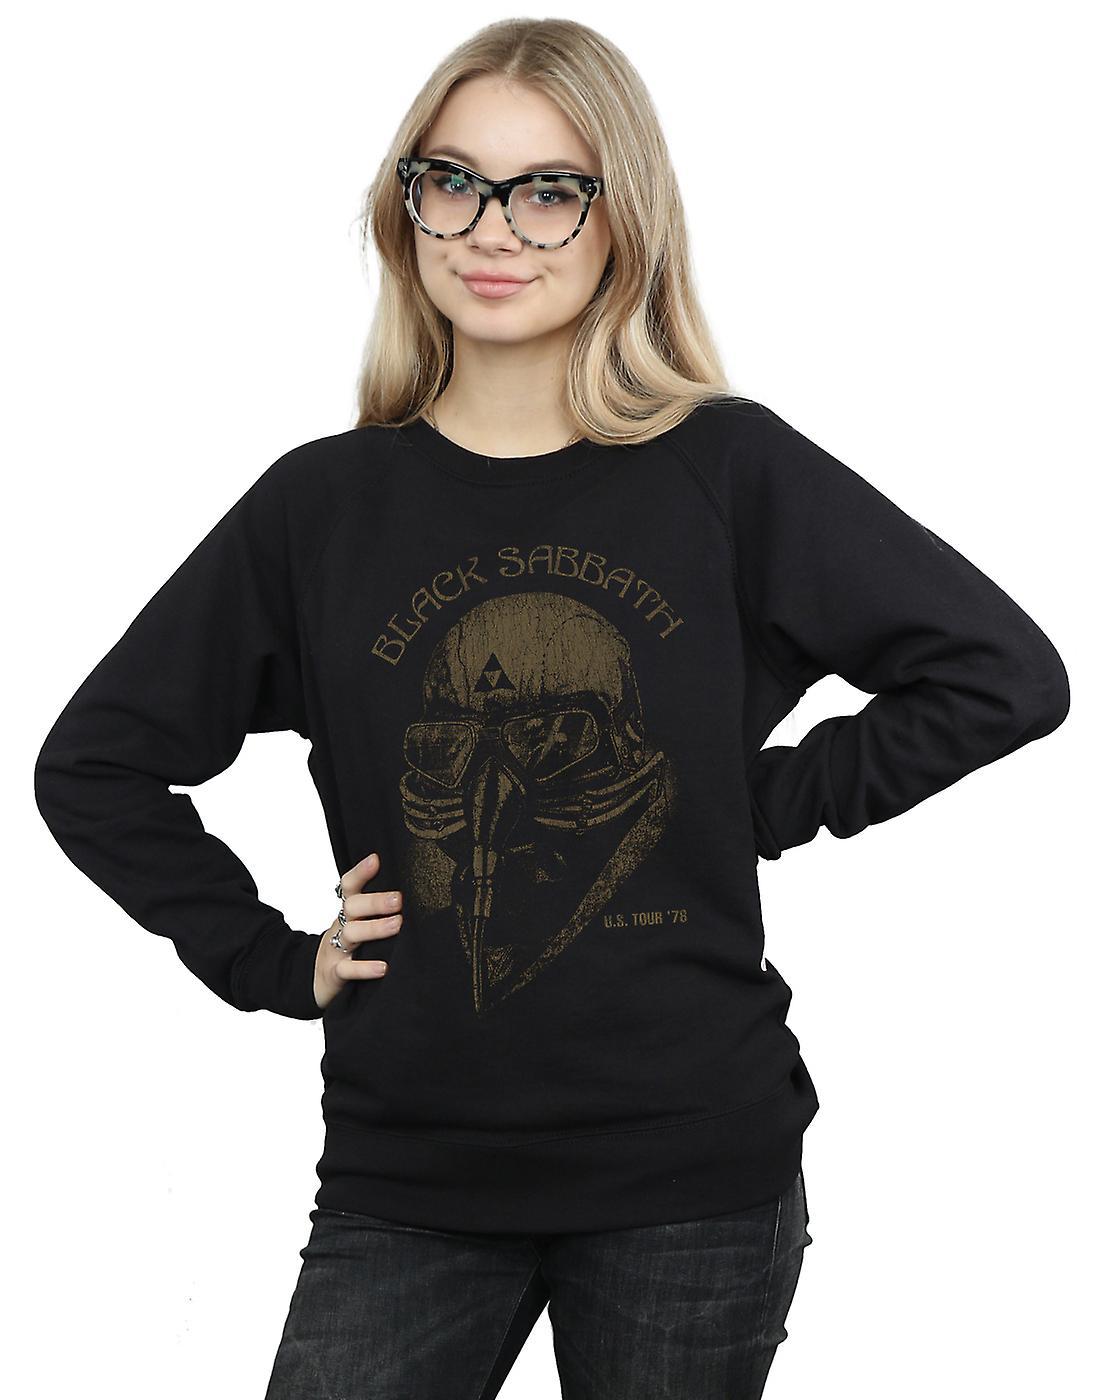 Black Sabbath Women's Tour 78 Sweatshirt